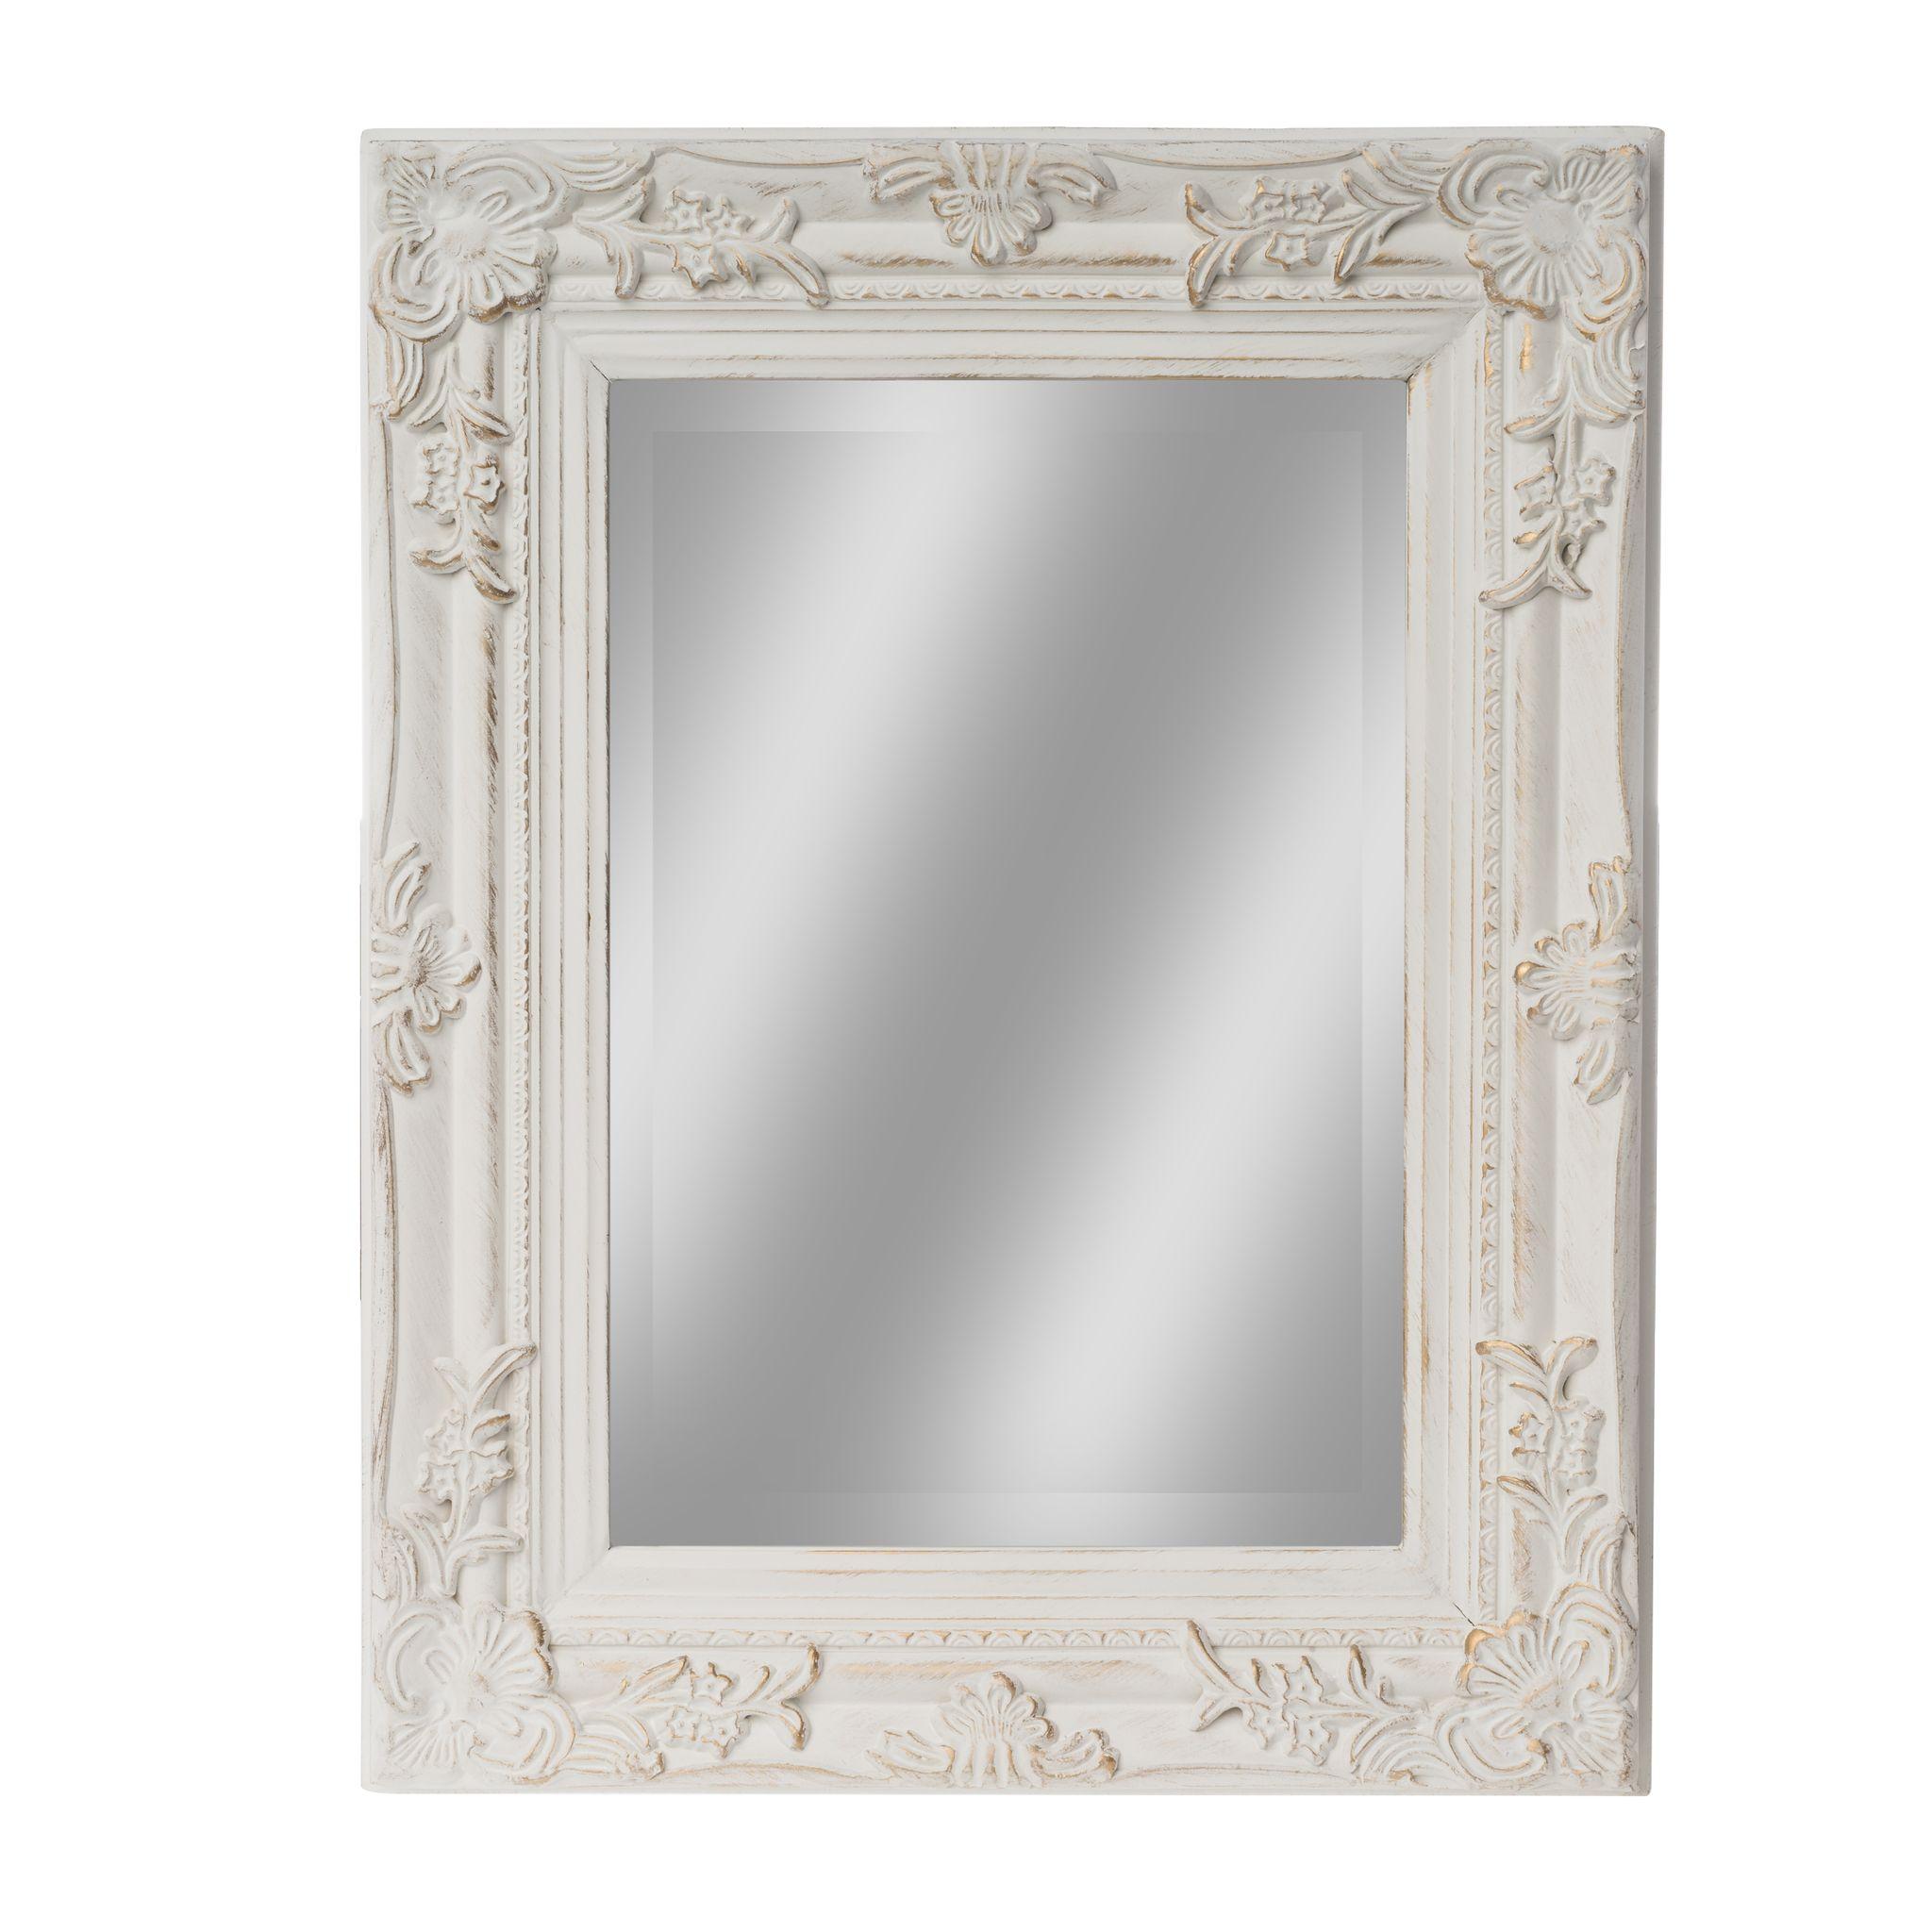 spiegel wei antik 45x35 cm holz neu wandspiegel barock. Black Bedroom Furniture Sets. Home Design Ideas